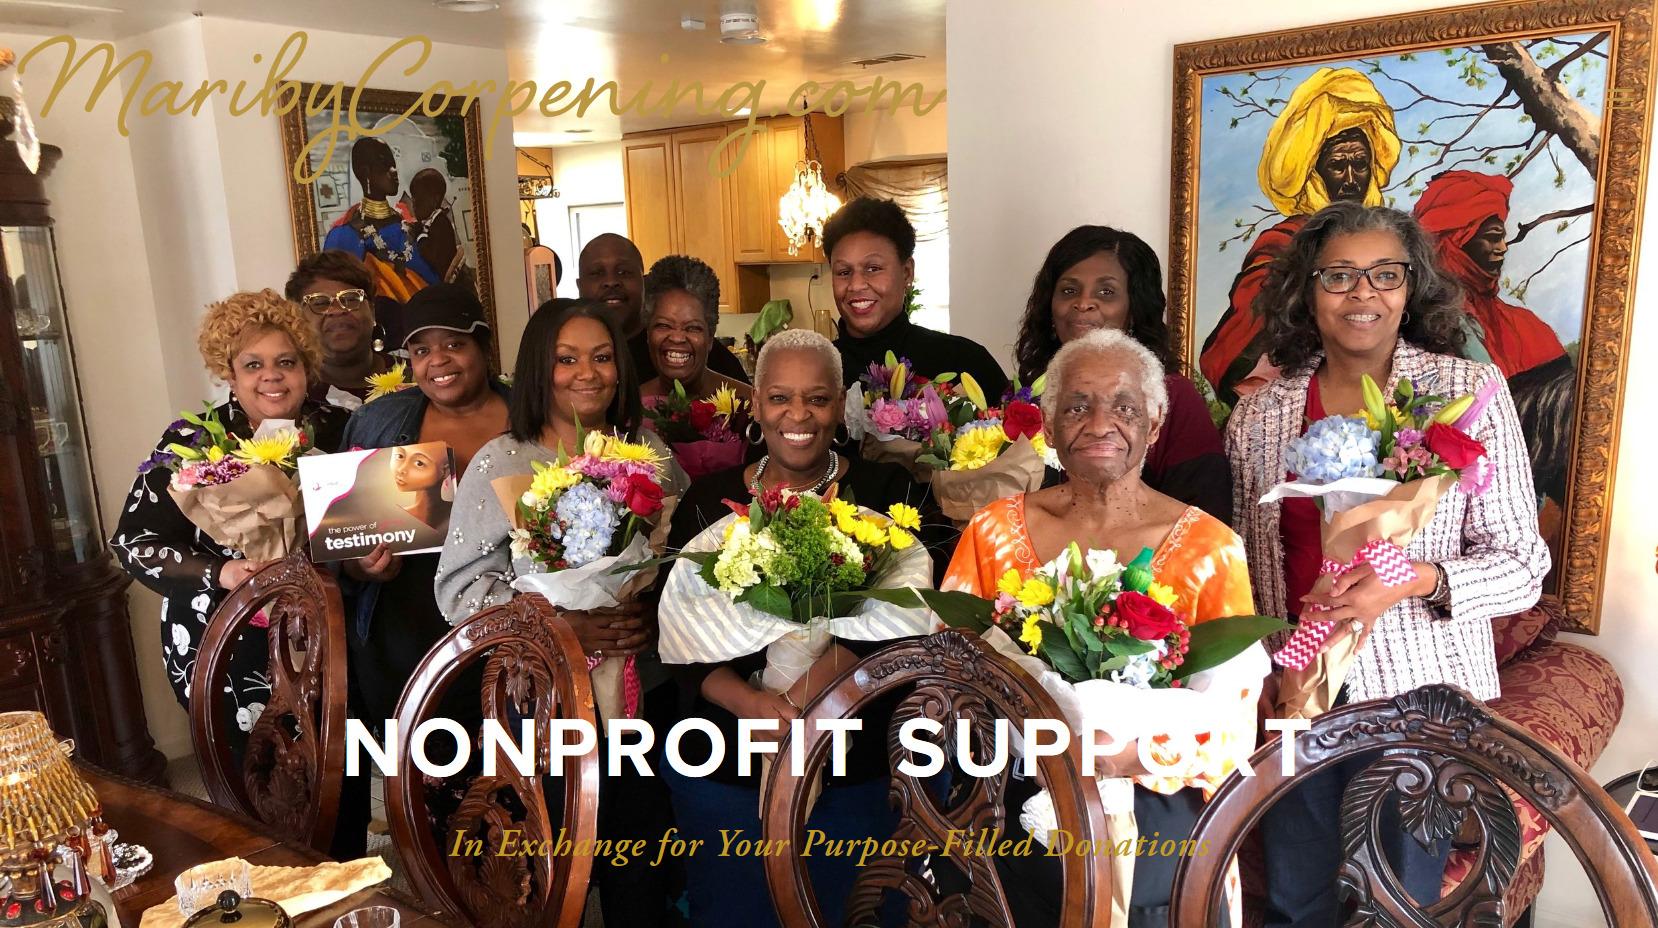 Screenshot_2019-07-21 NonProfit Support — MaribyCorpening com.jpg